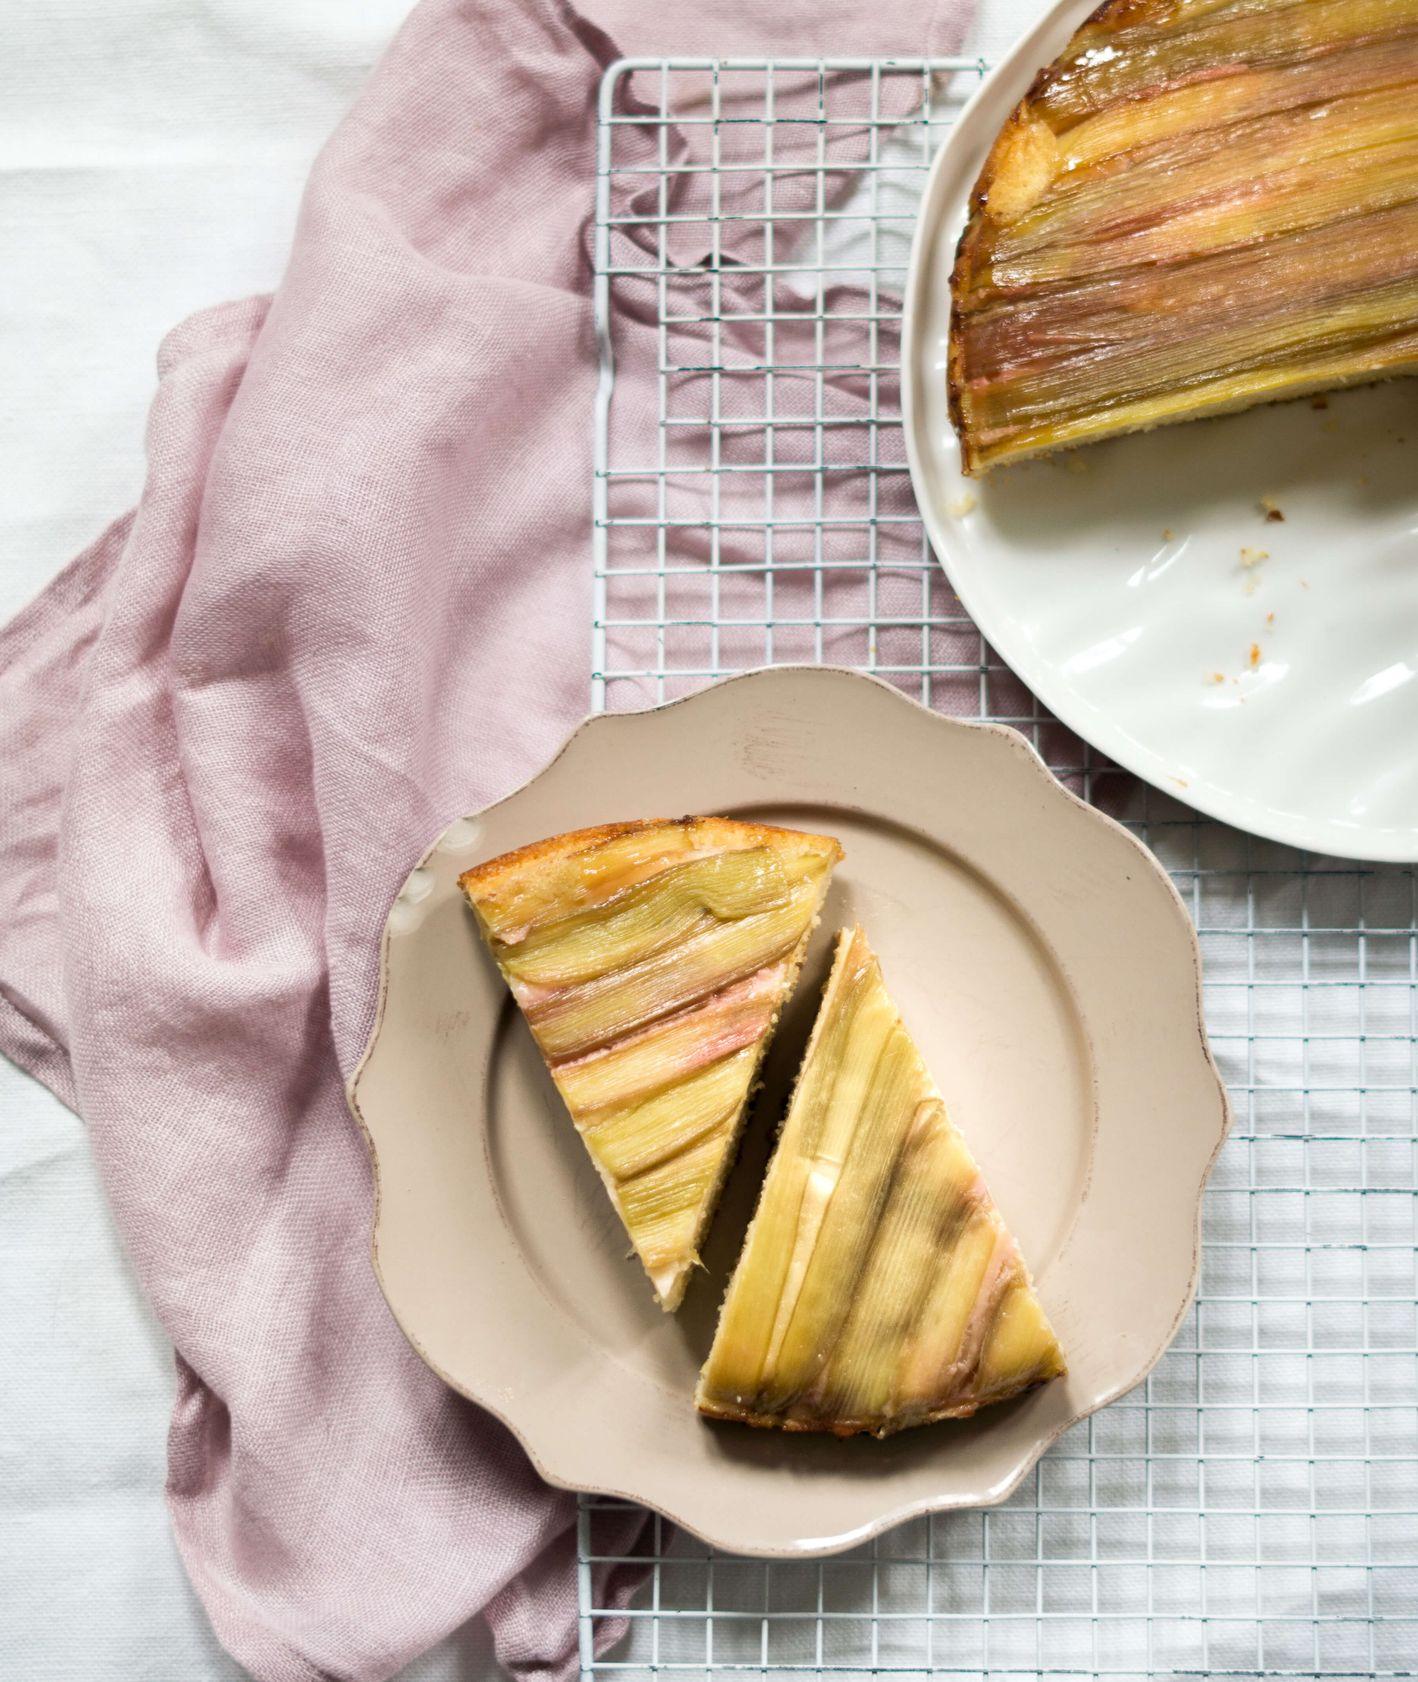 proste ciasto z rabarbarem, ciasto z rabarbarem, rabarbar, ciasto jogurtowe